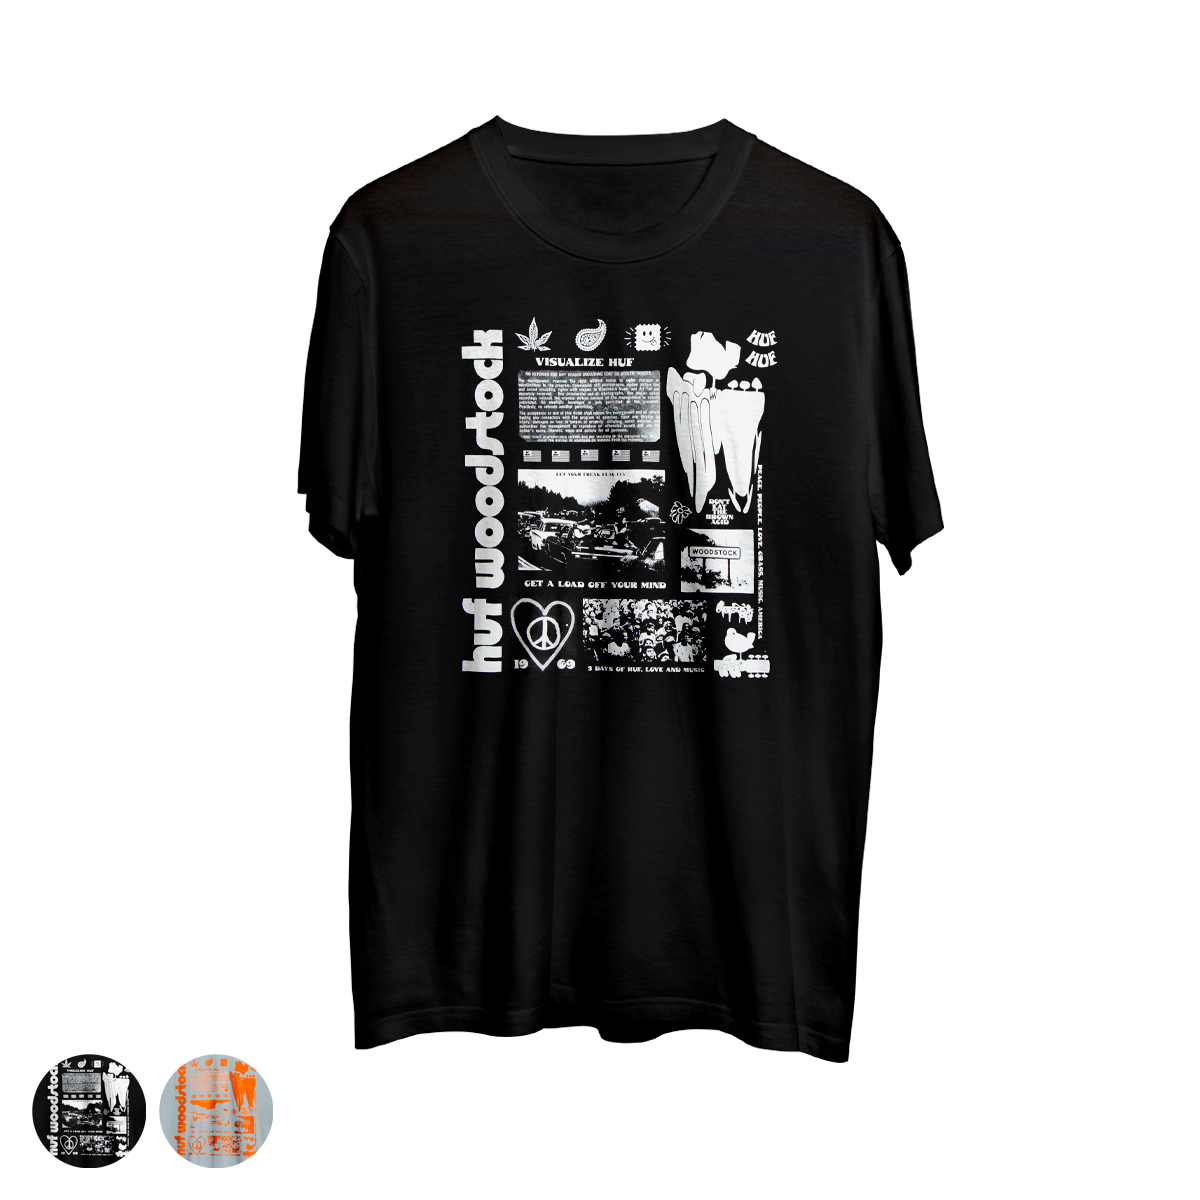 Woodstock x HUF Visualize T-shirt